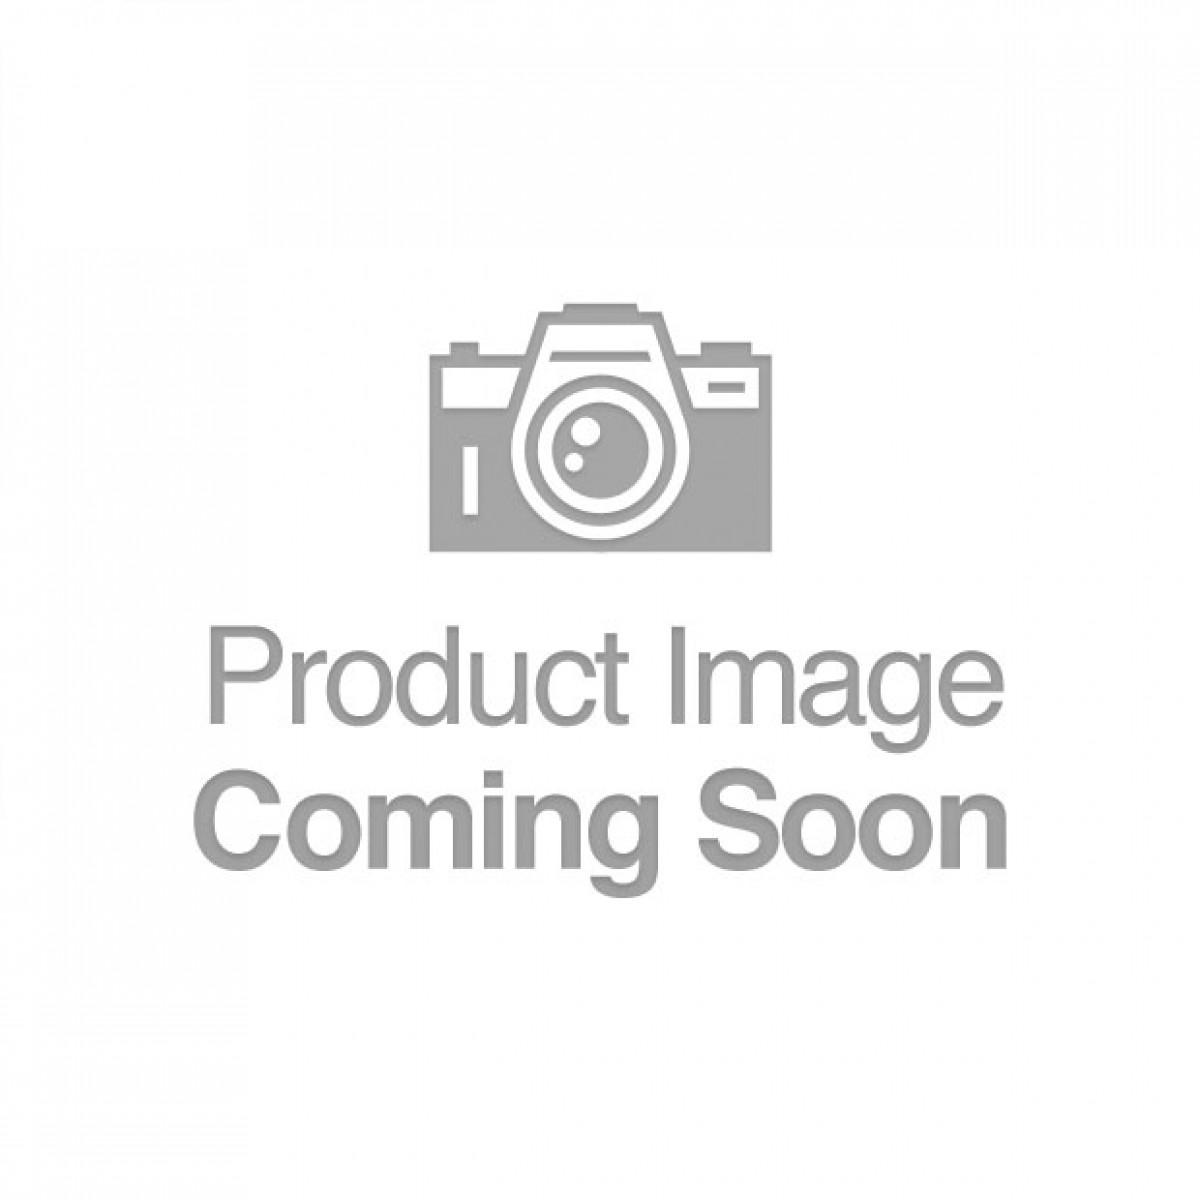 Le Stelle Hidra Series - Charcoal Grey